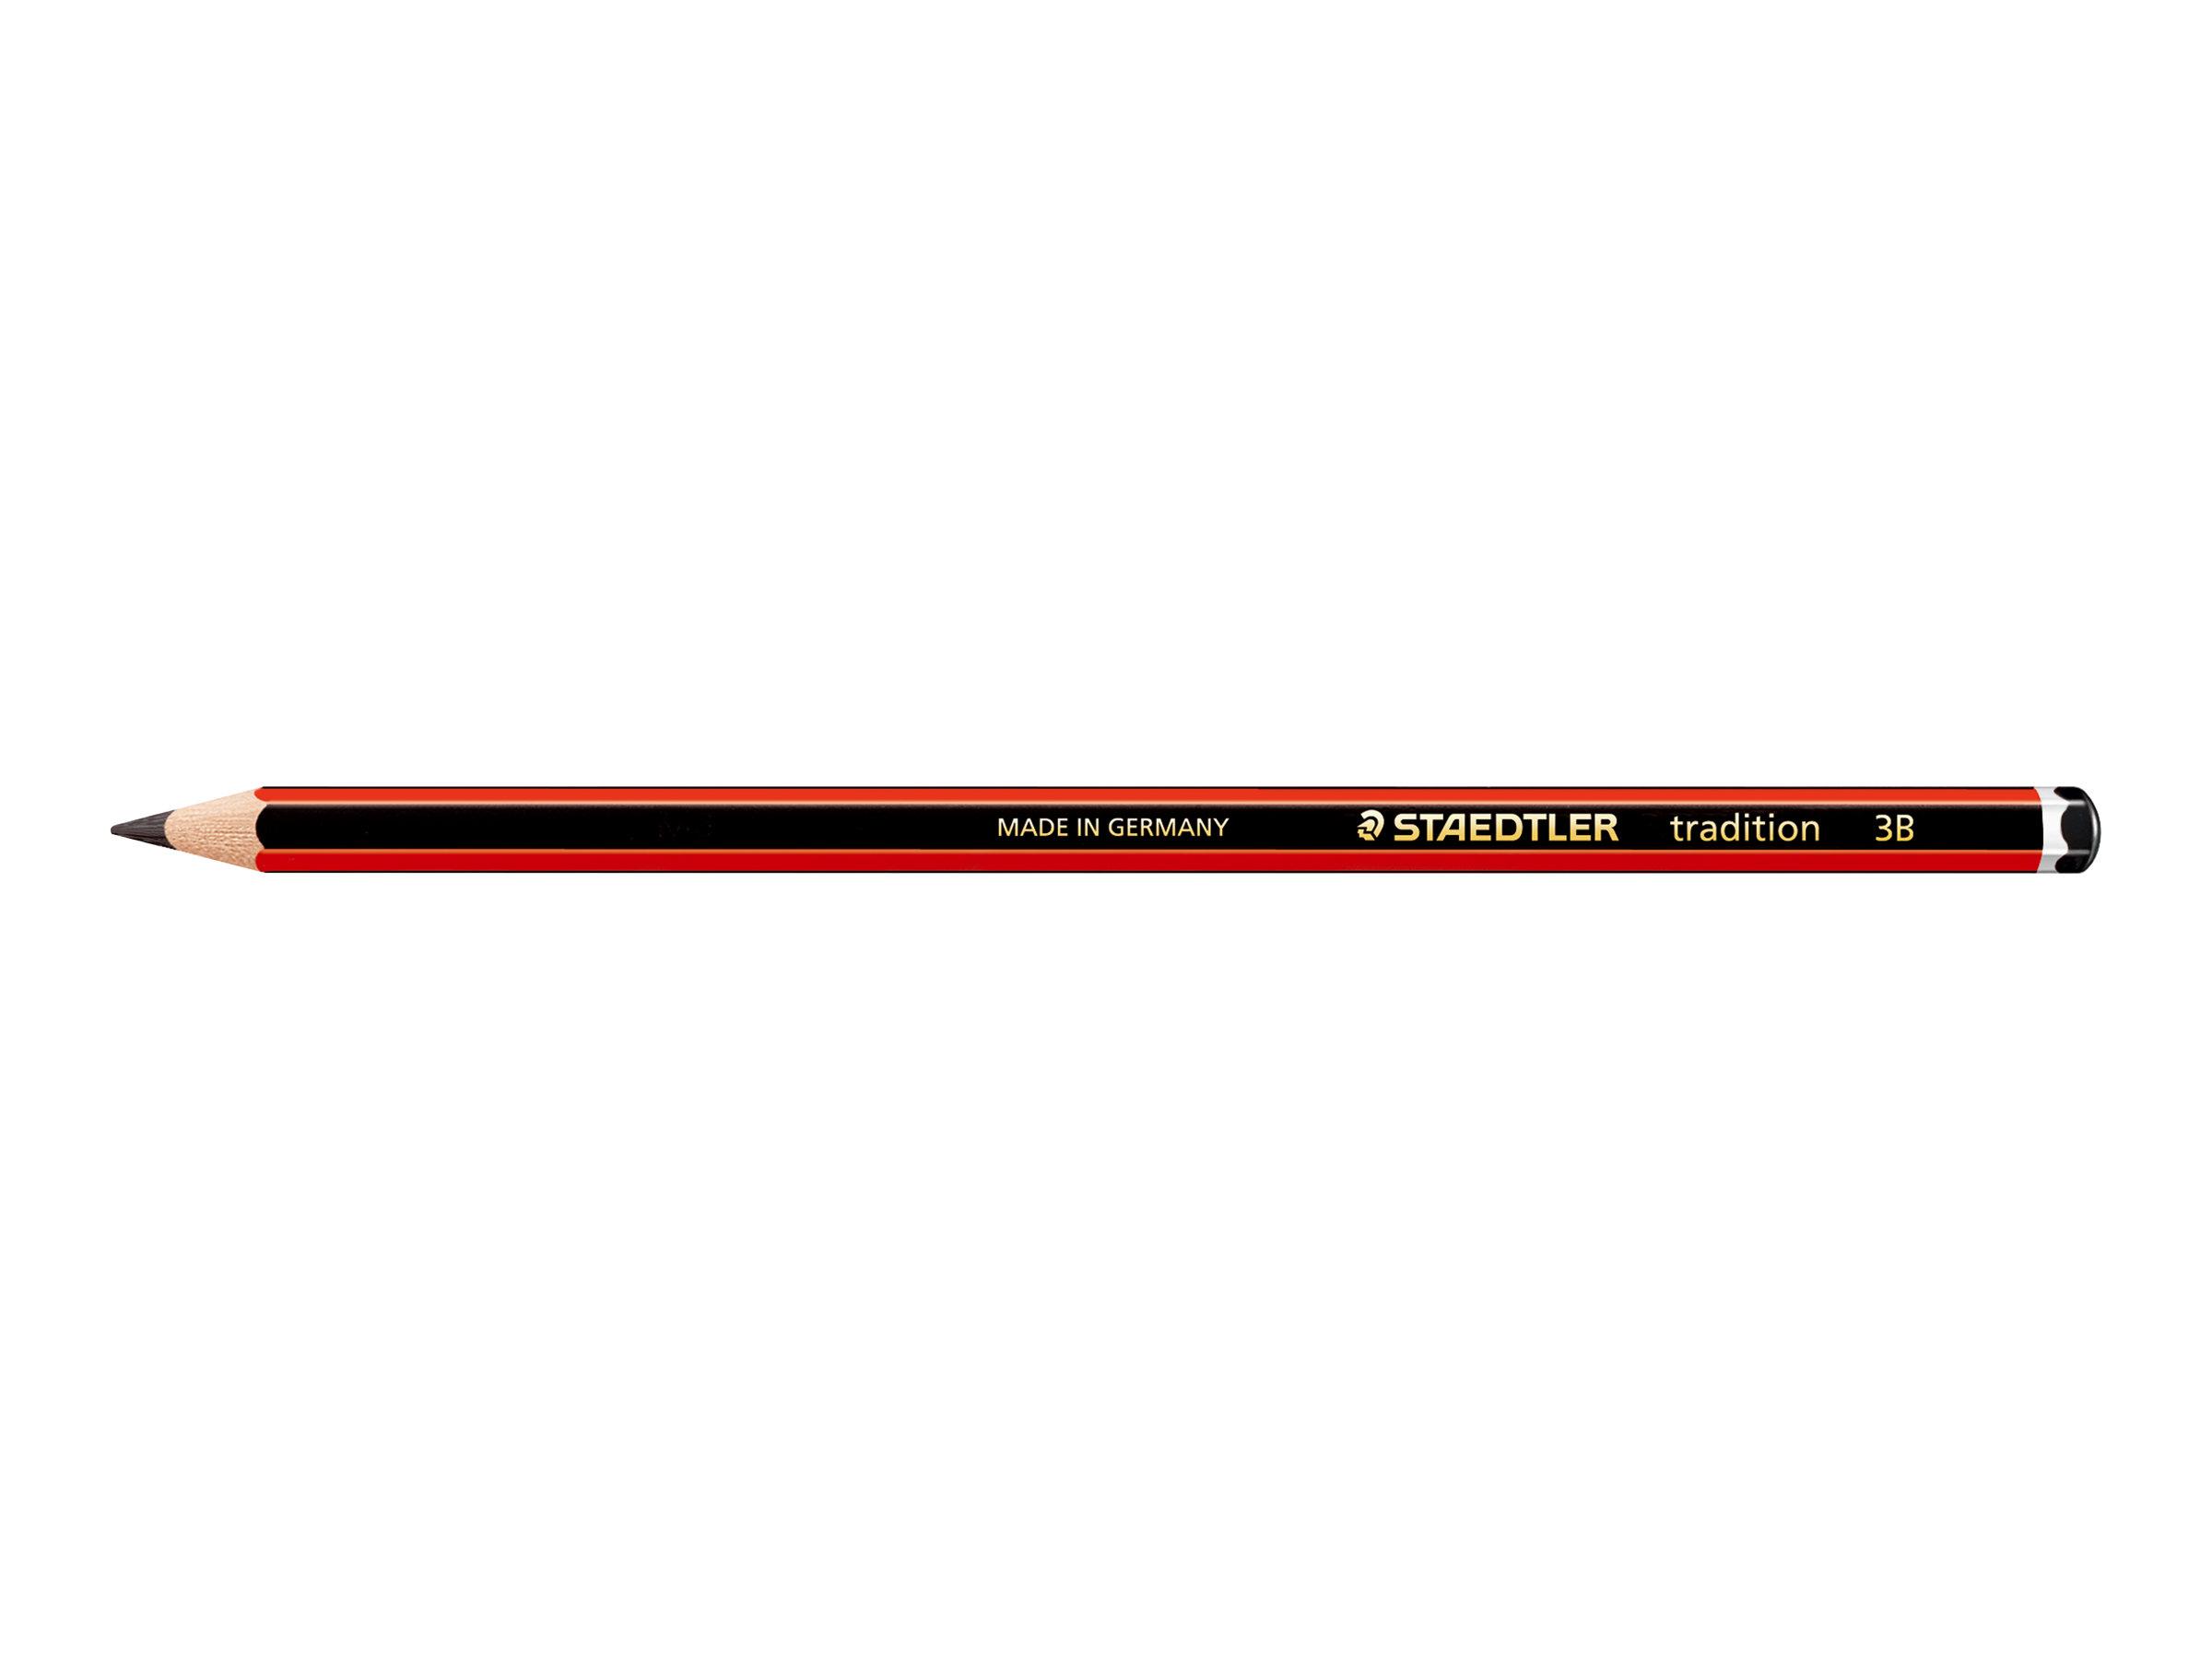 STAEDTLER Tradition - Crayon à papier - 3B - 2 mm